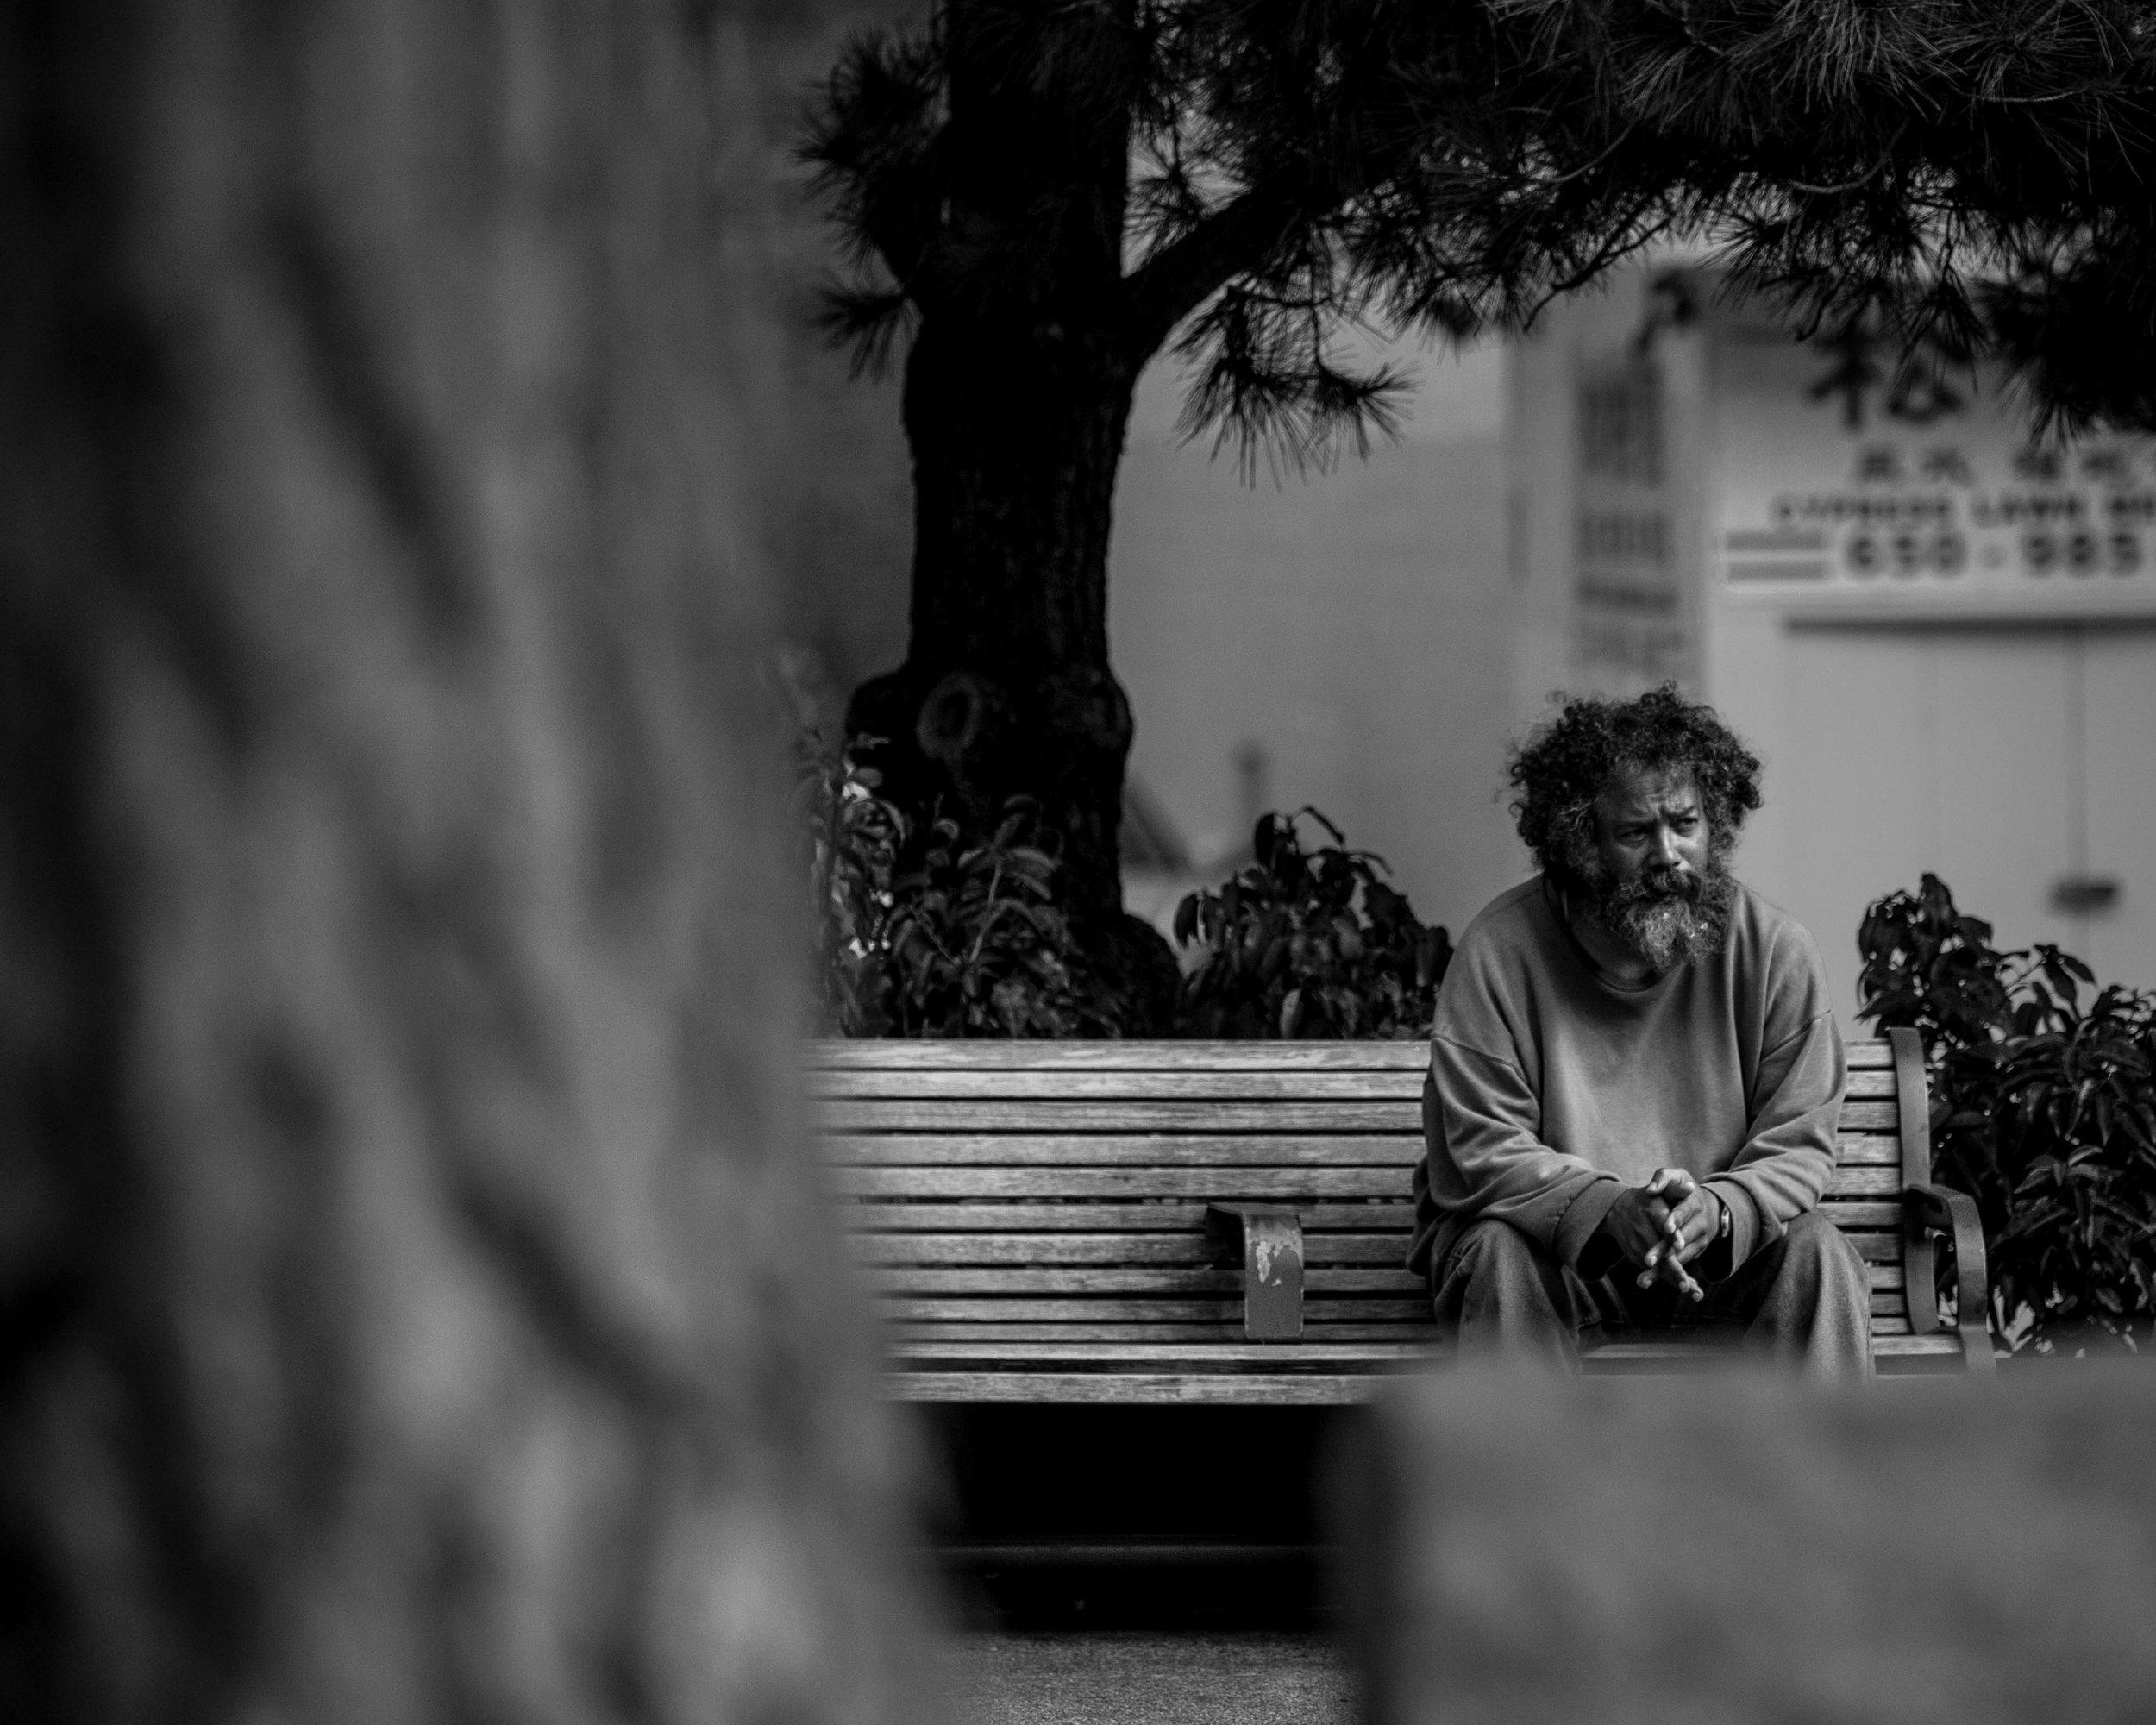 homeless_chinatown_sf_bw_8x10 (1 of 1).jpg